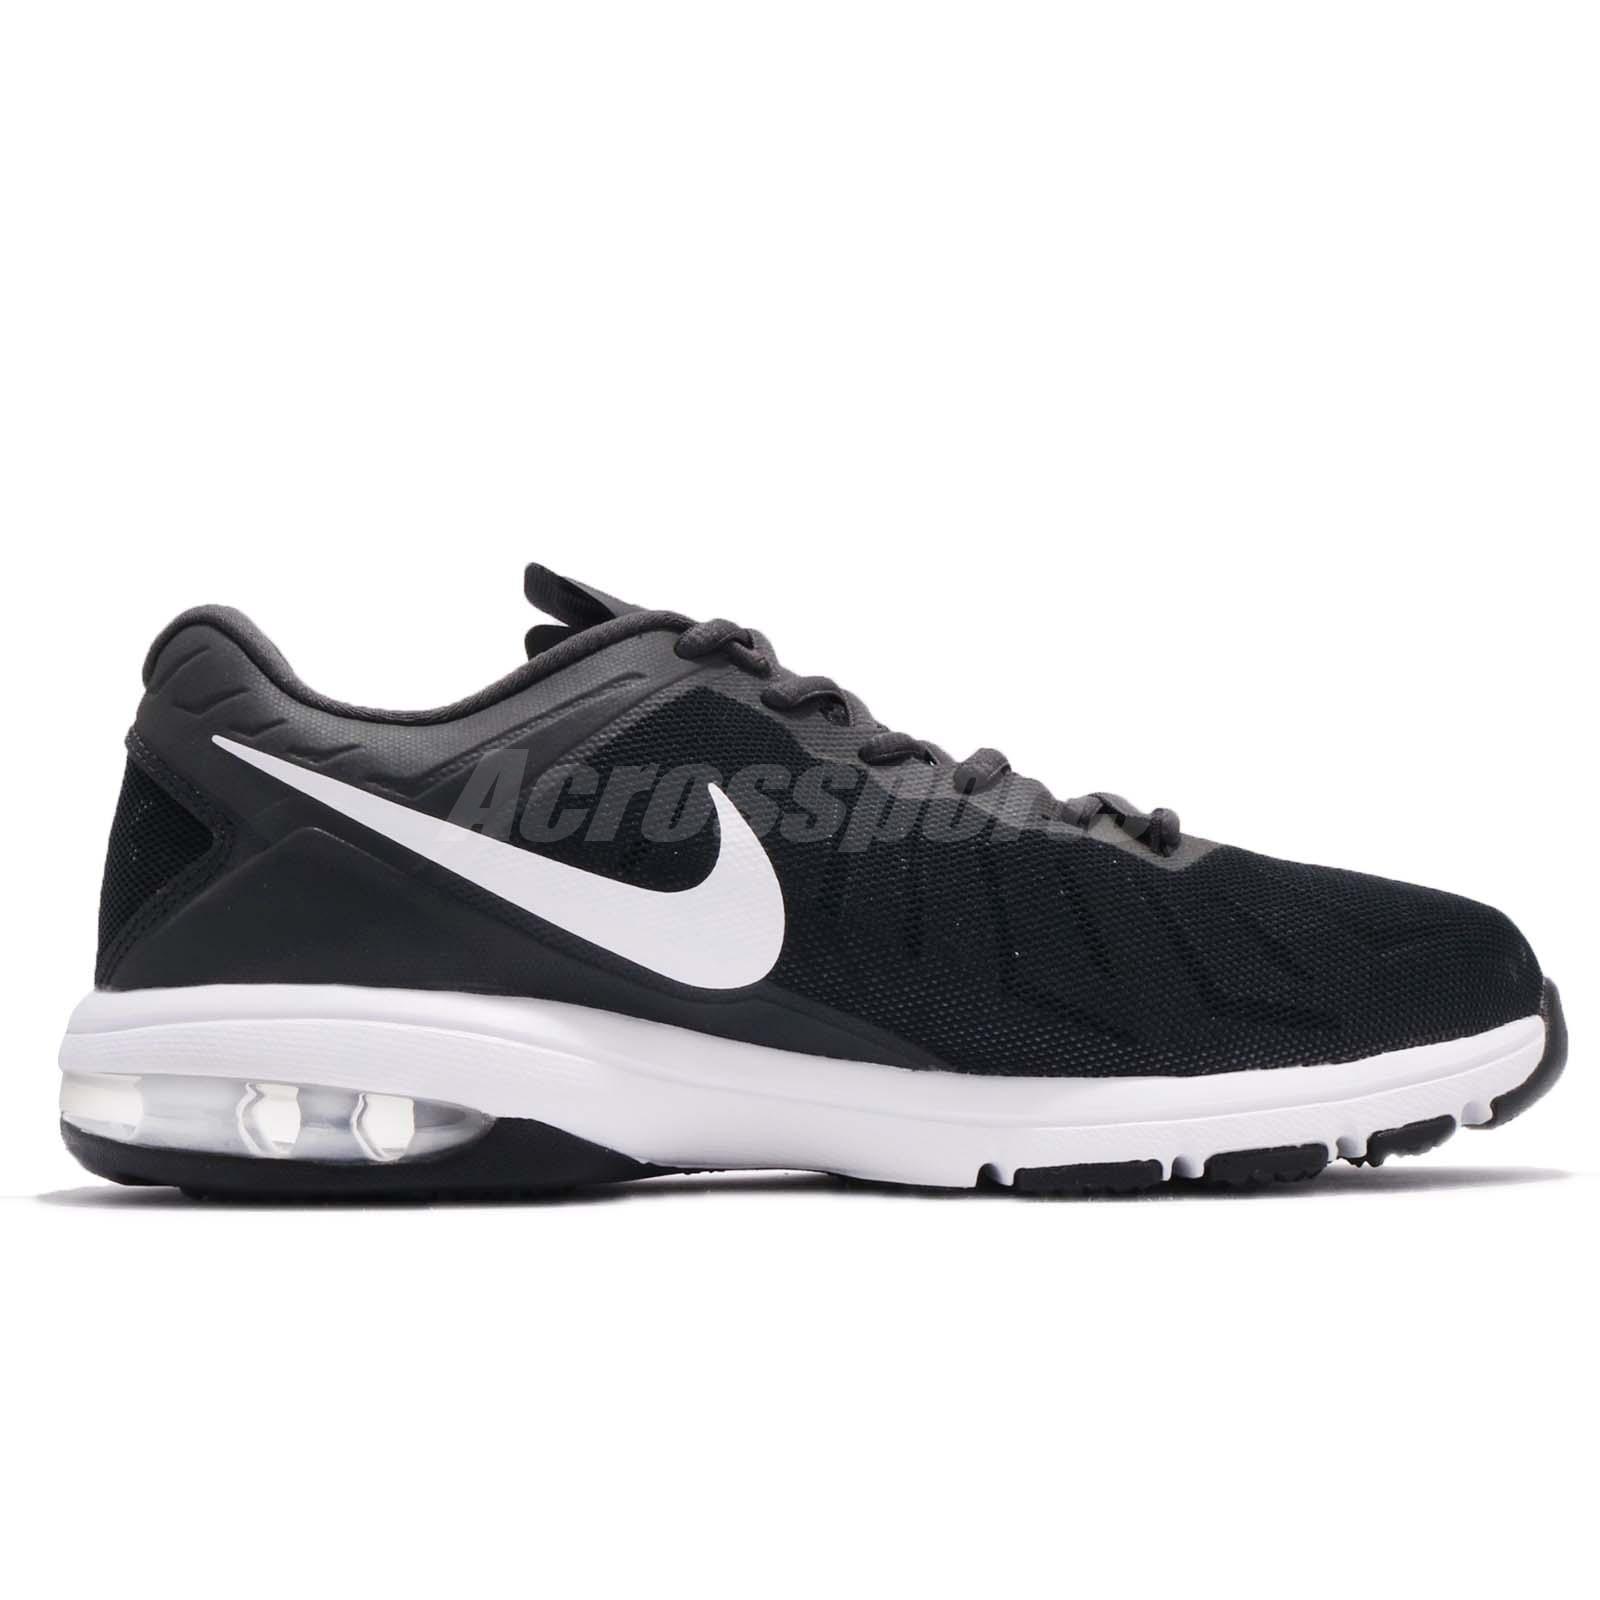 7f2b3dc6be42 ... where can i buy fully black nike shoes buy nike revolution 2 5e8ea 44f7b